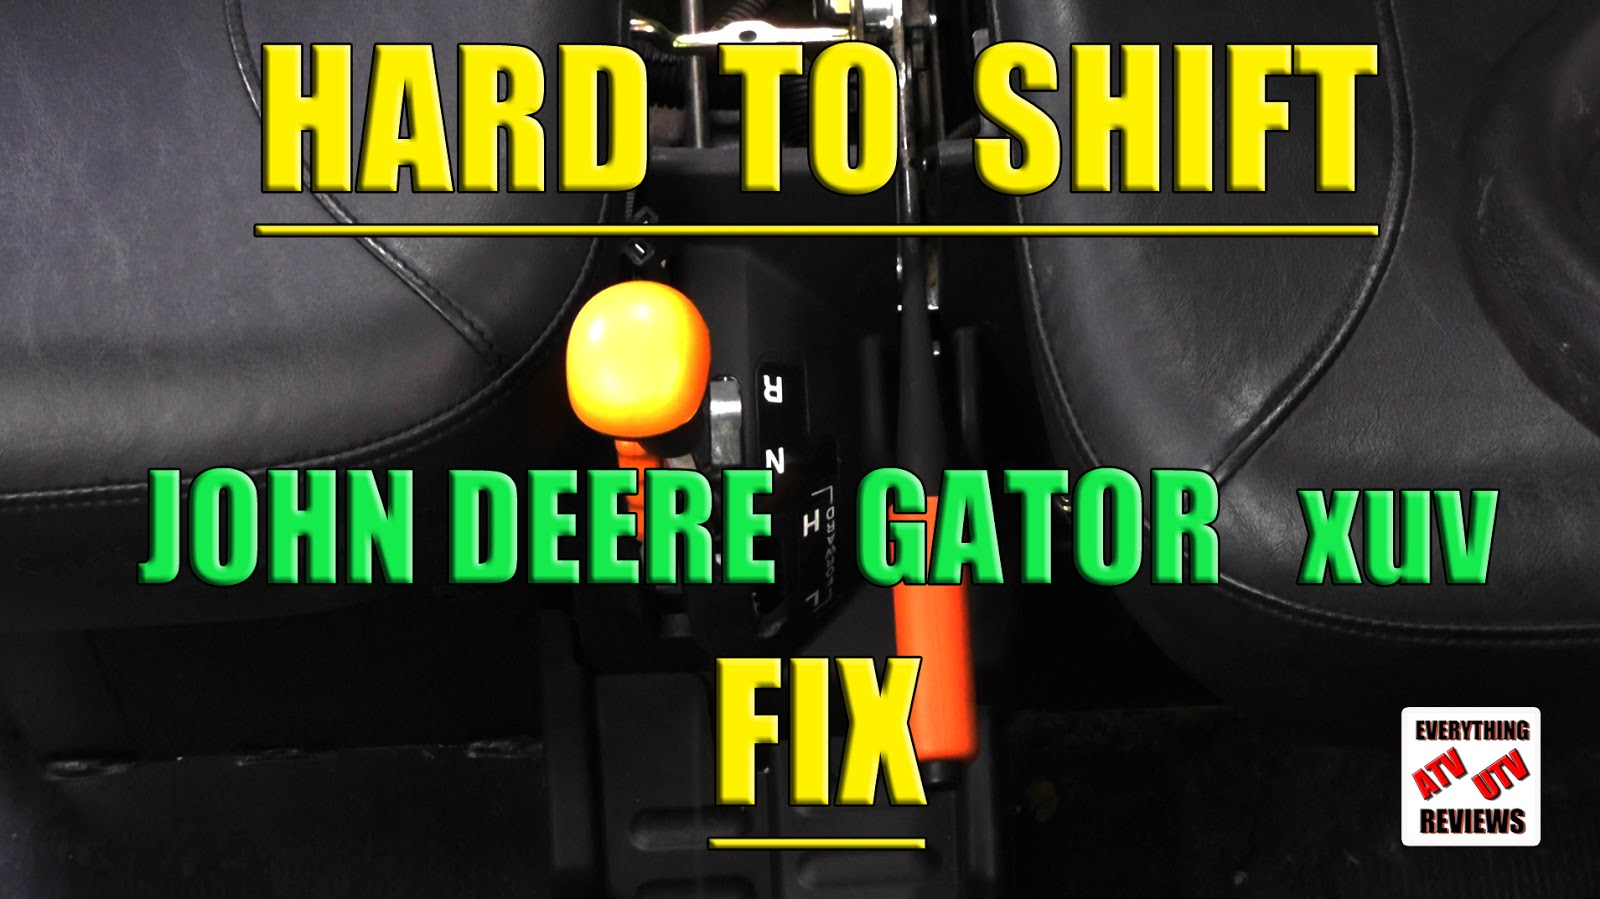 medium resolution of 2013 john deere gator 855d wiring diagram everything atv utv reviews john deere gator